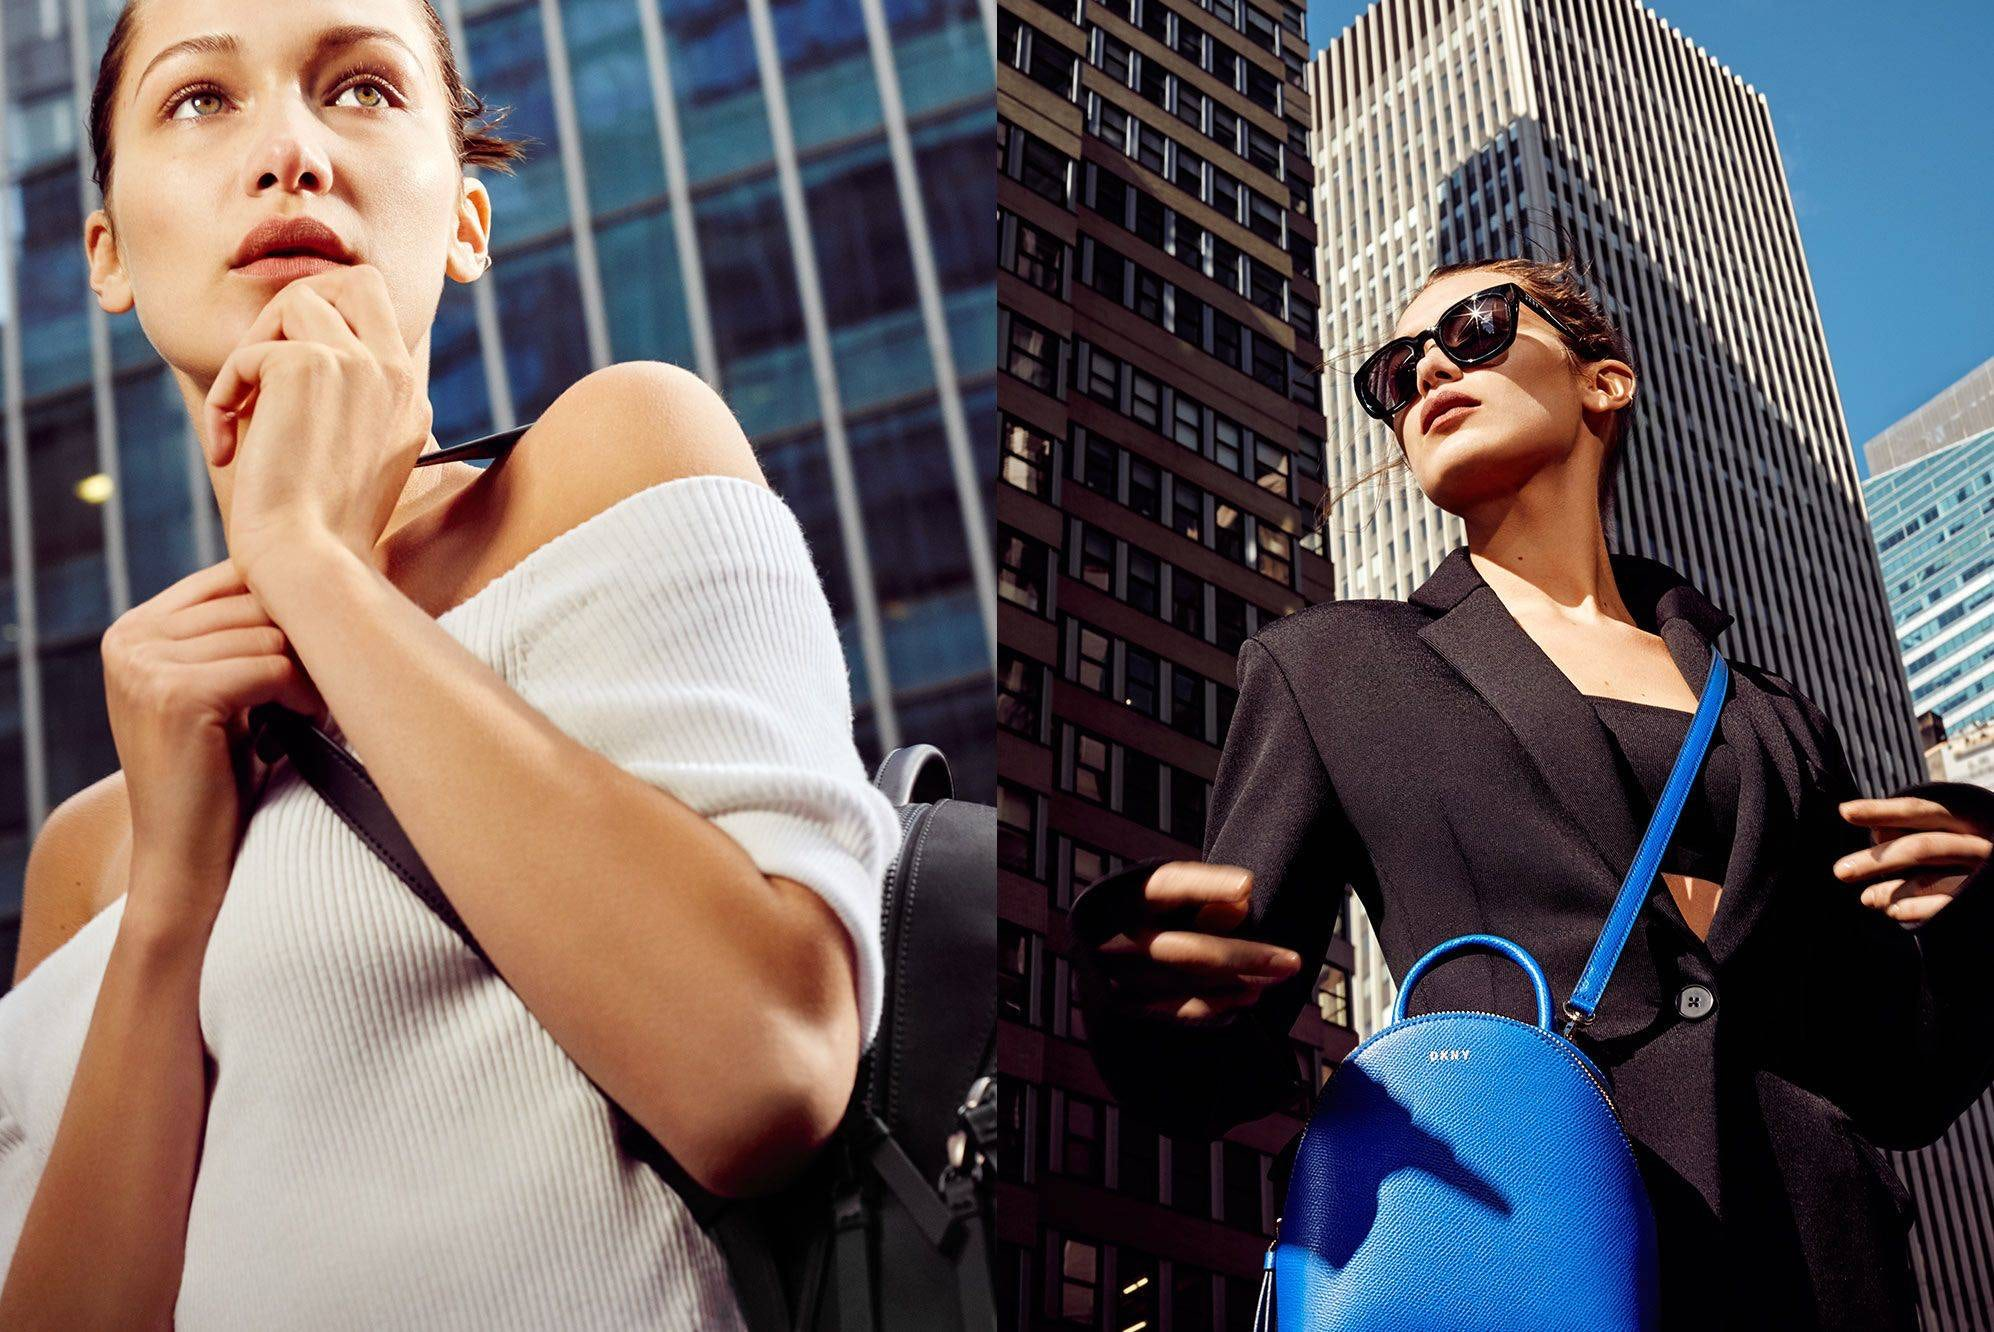 DKNY and Ivanka Trump Apparel Maker G-III Falls on Forecast